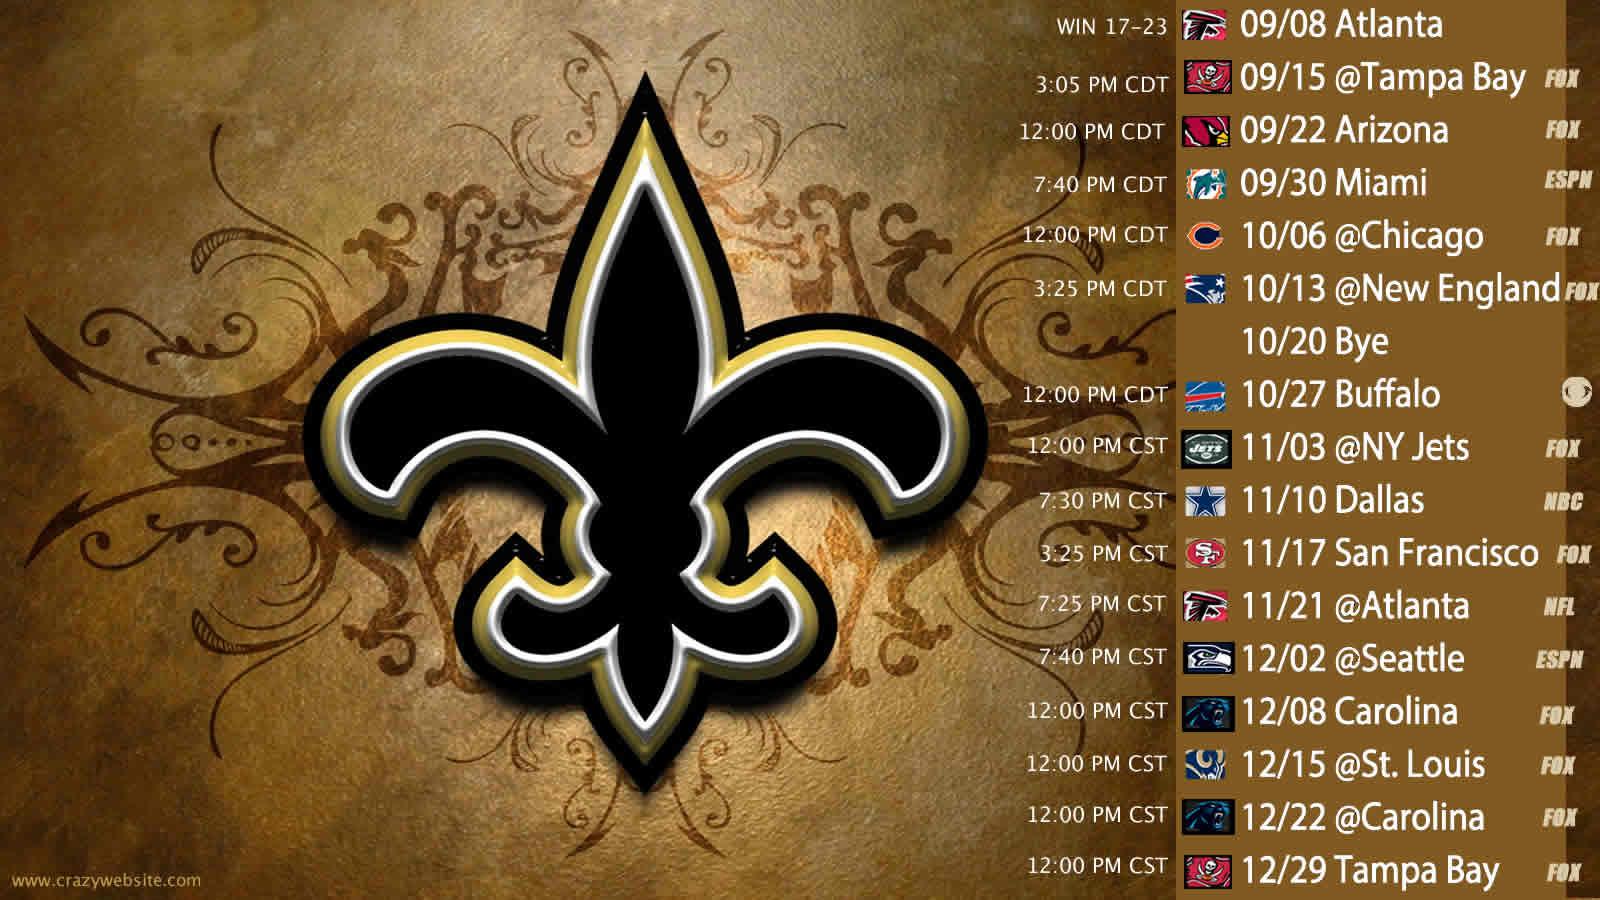 49 New Orleans Saints Wallpaper 2016 On Wallpapersafari